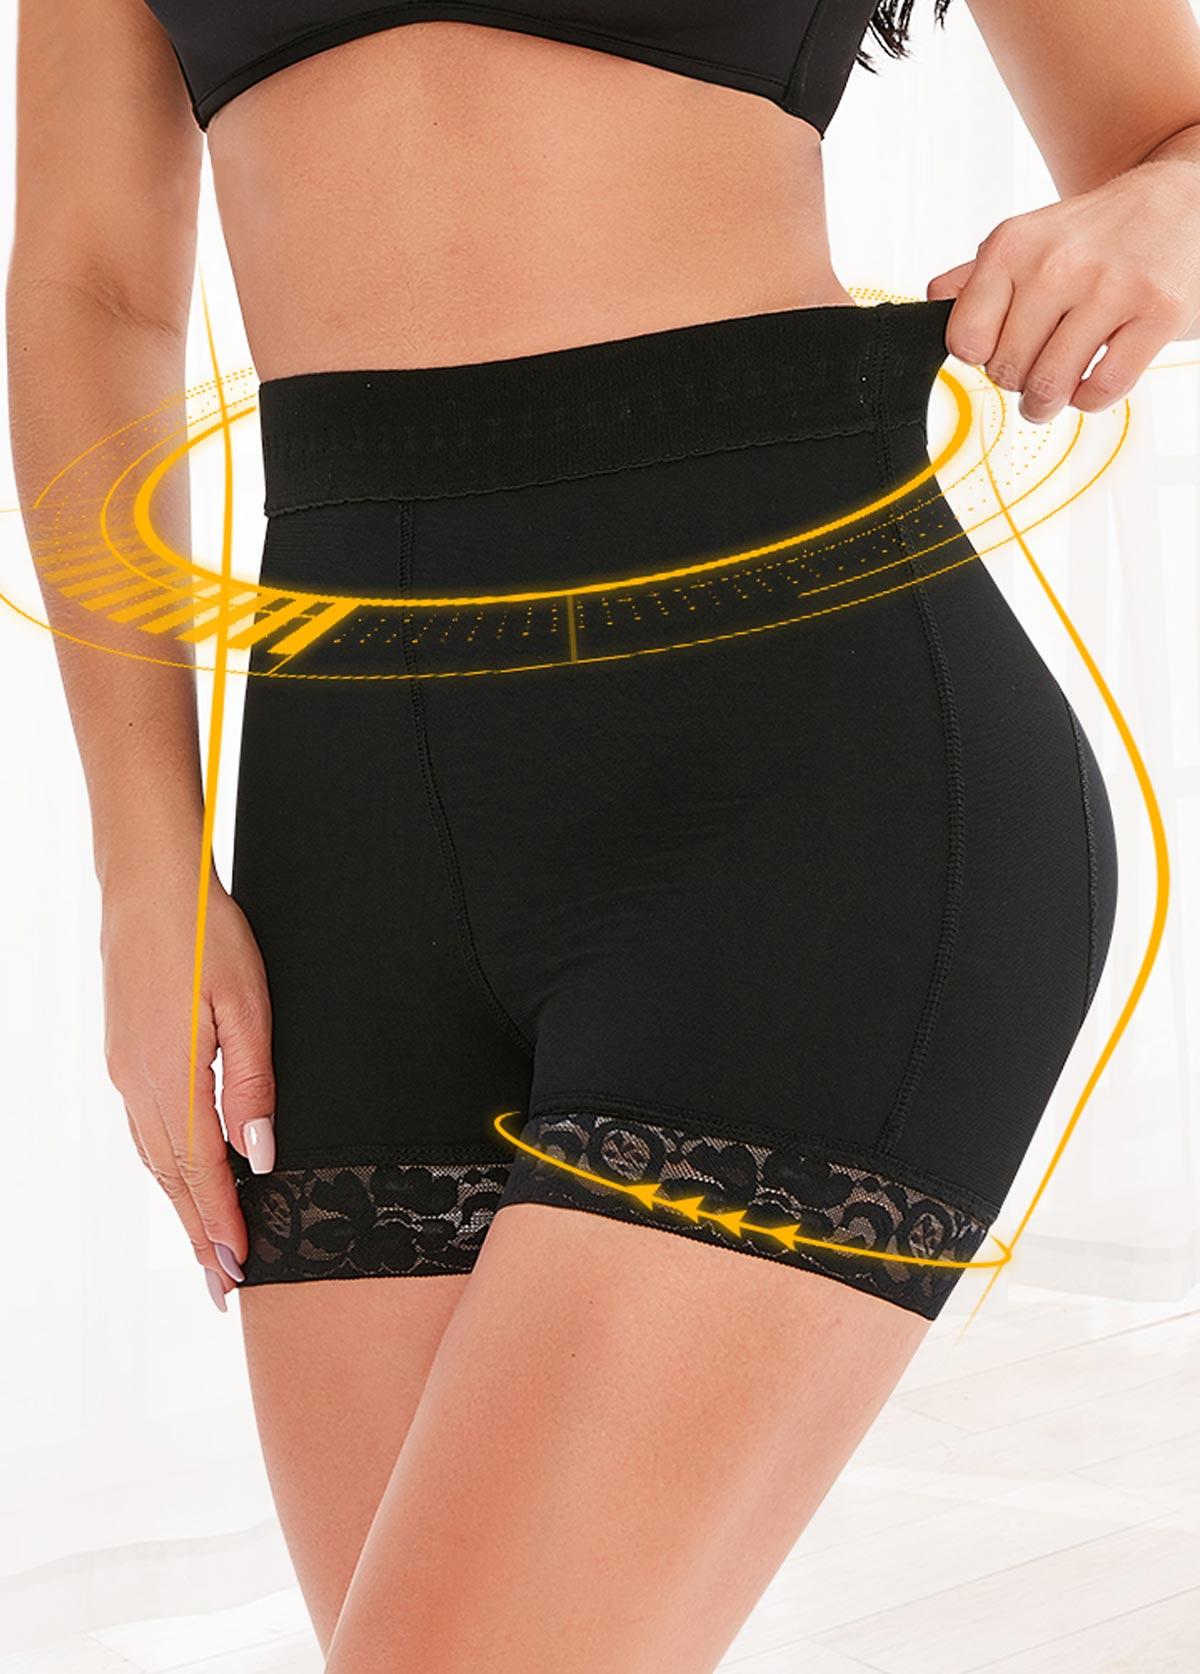 High Waist Breathable Mesh Black Panties